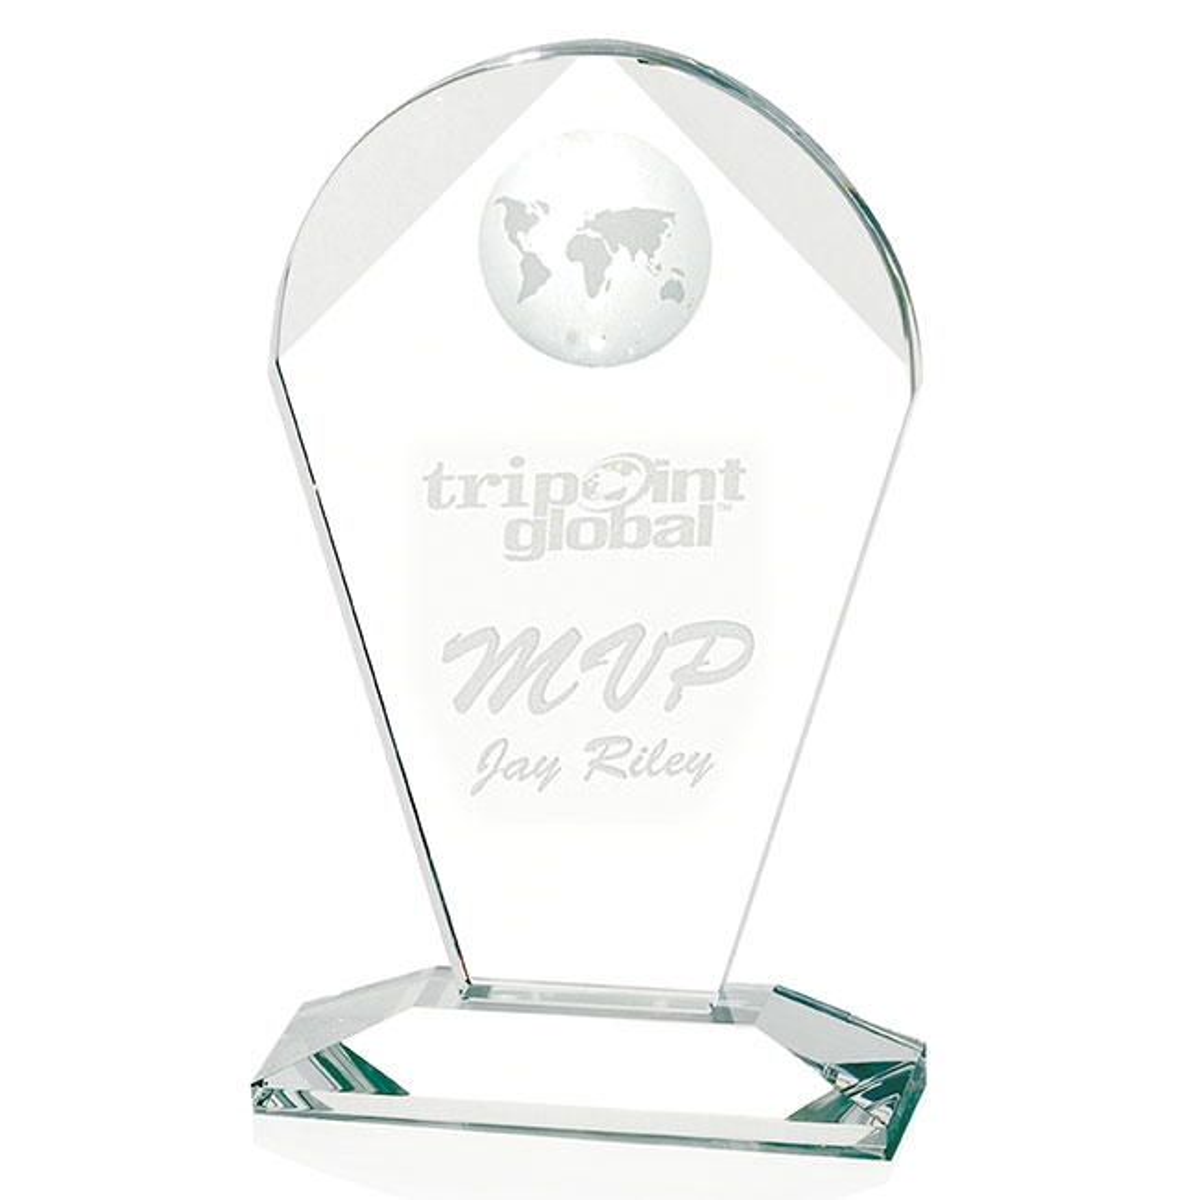 Jaffa Geodesic Large Award - Deep Etch Imprint